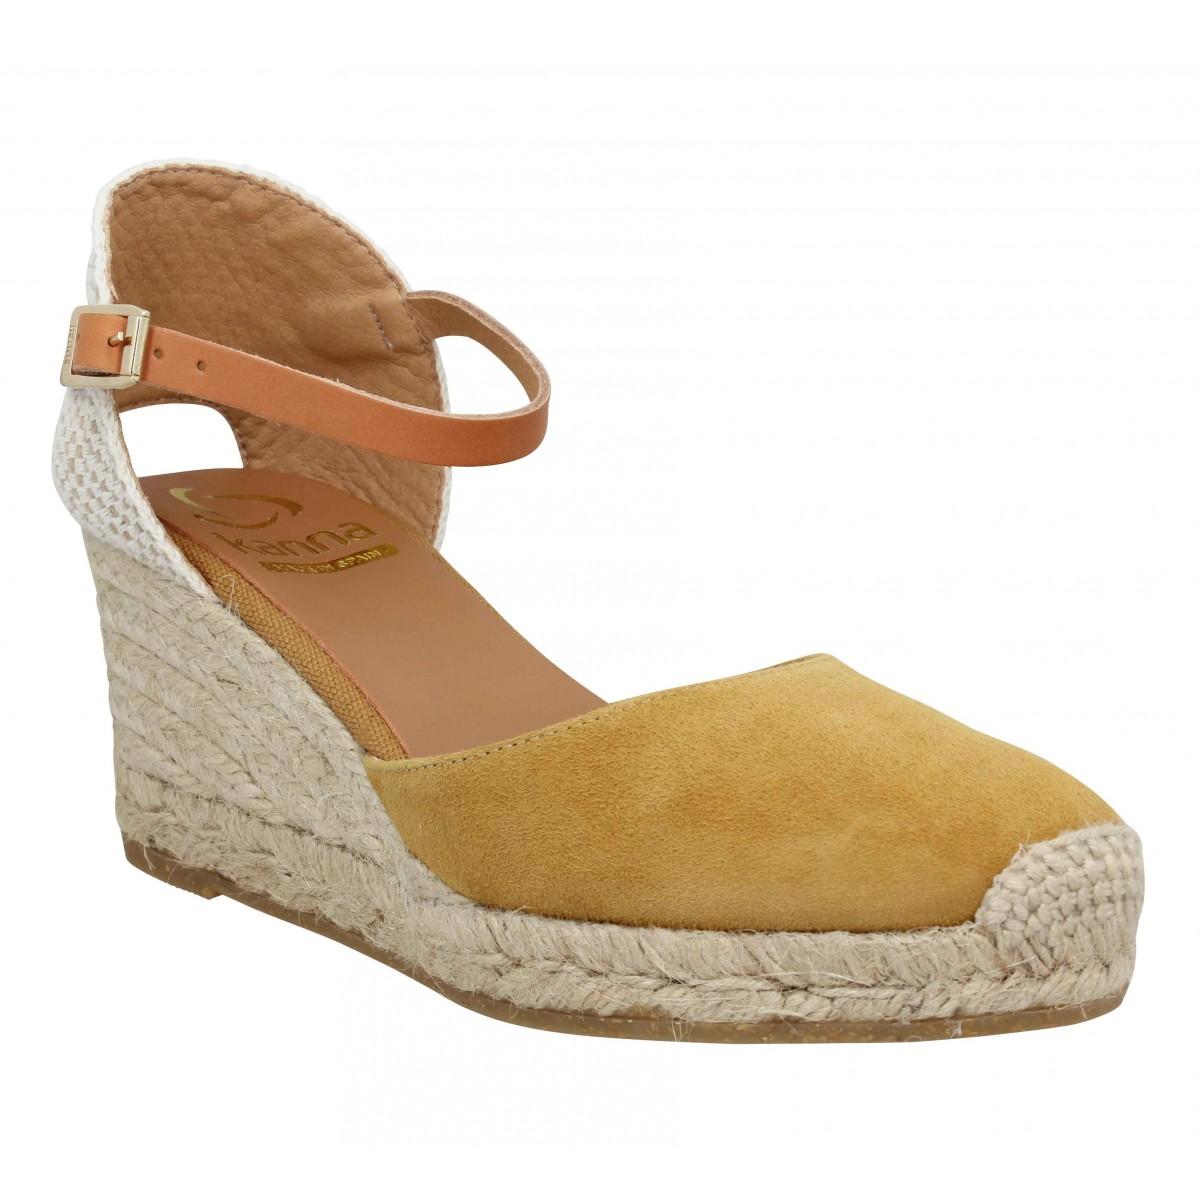 Sandales talons KANNA 9211 velours Femme Safran